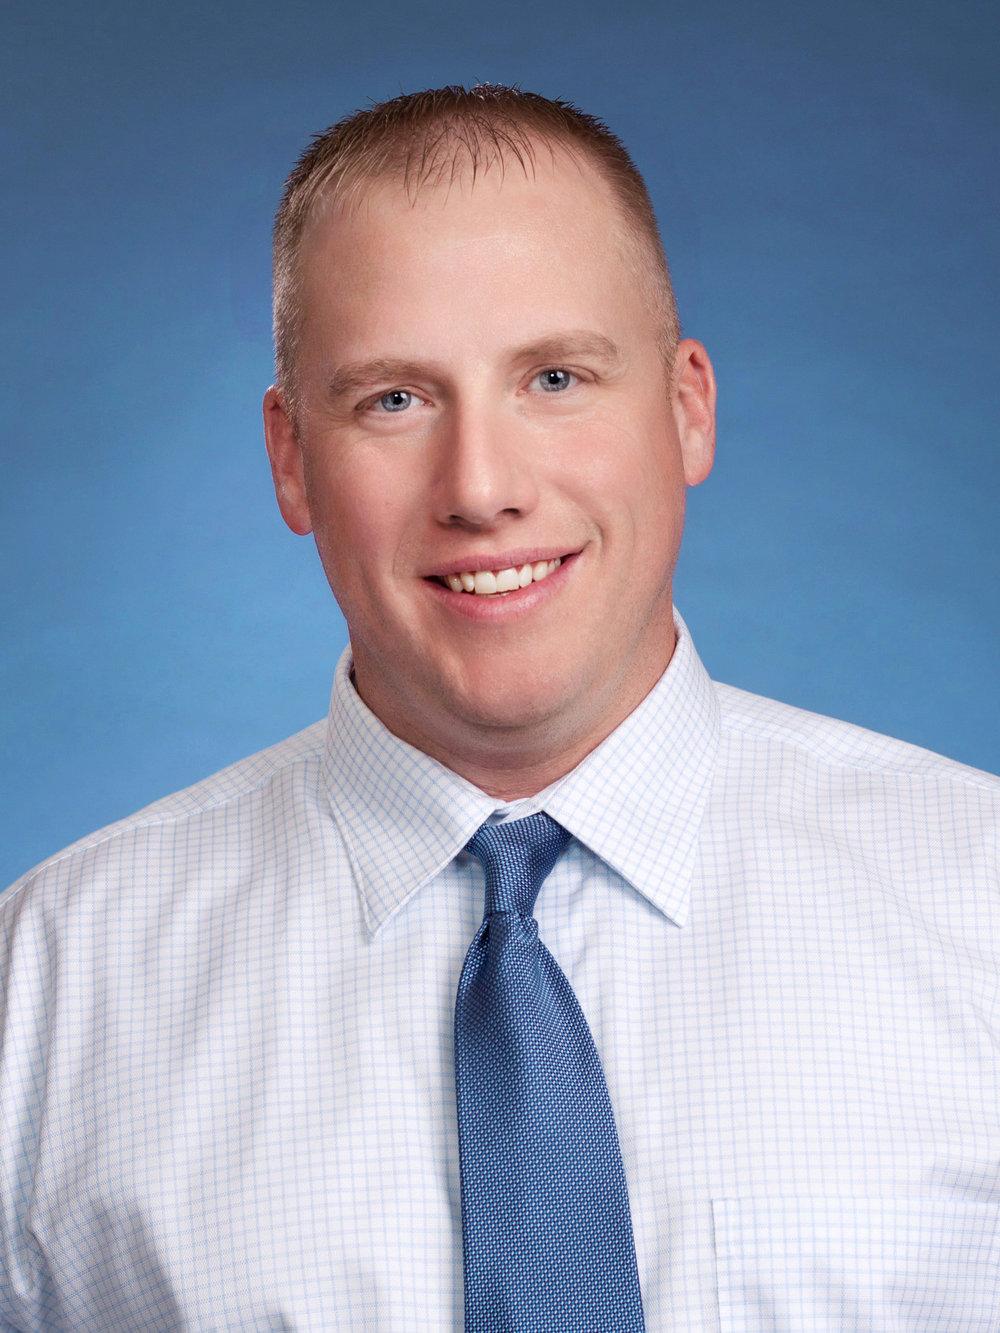 Thomas Robbins - Labor Superintendent